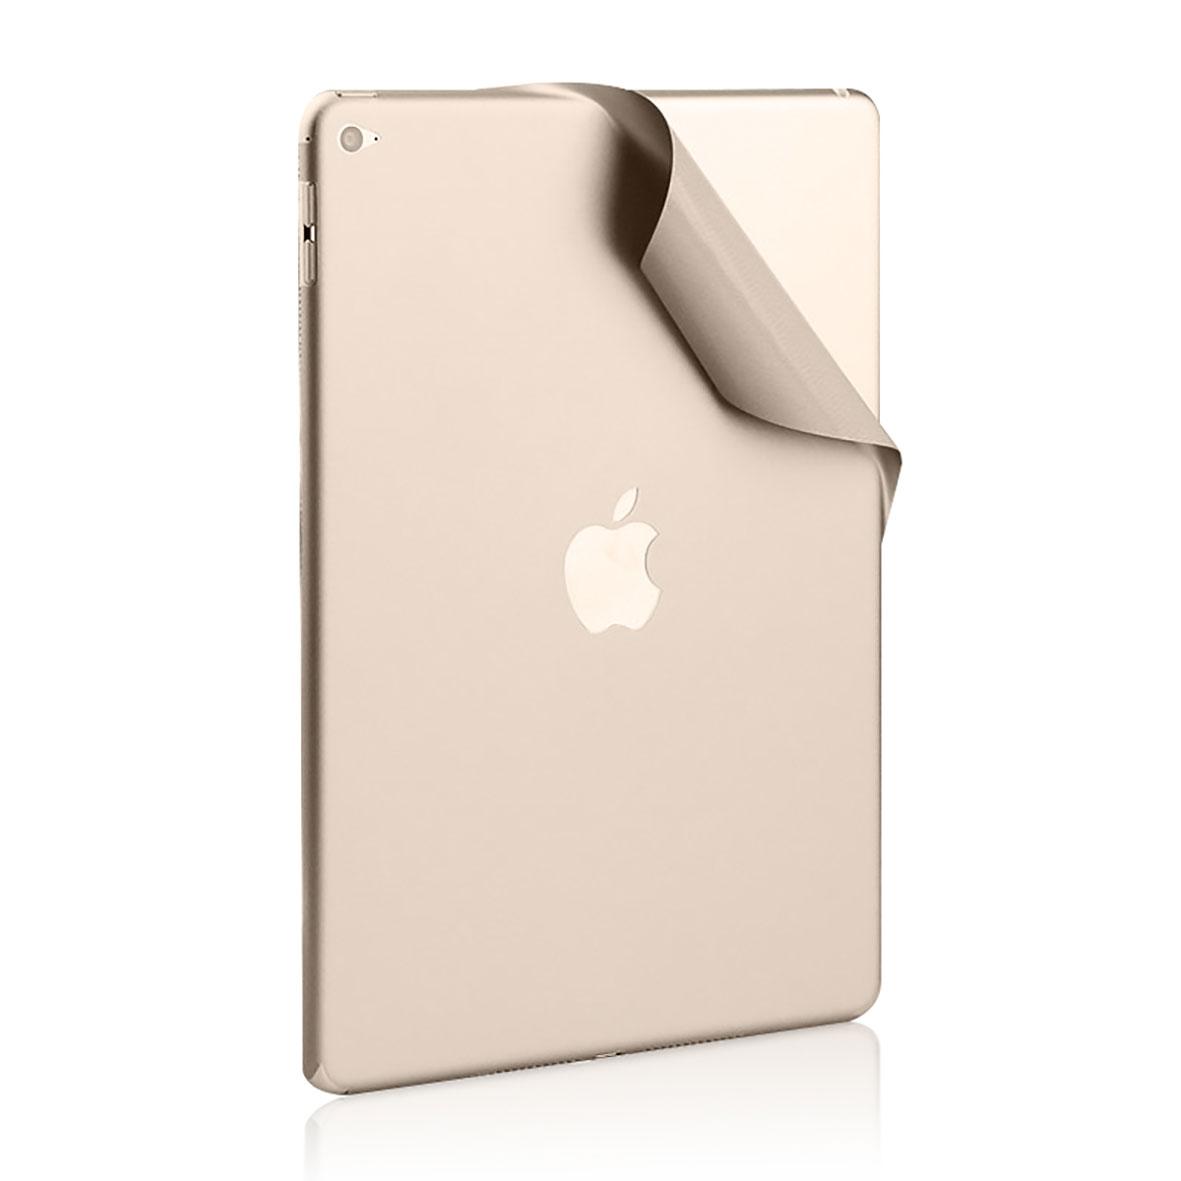 KMP Protective Skin Schutzfolie für iPad Mini 4, gold